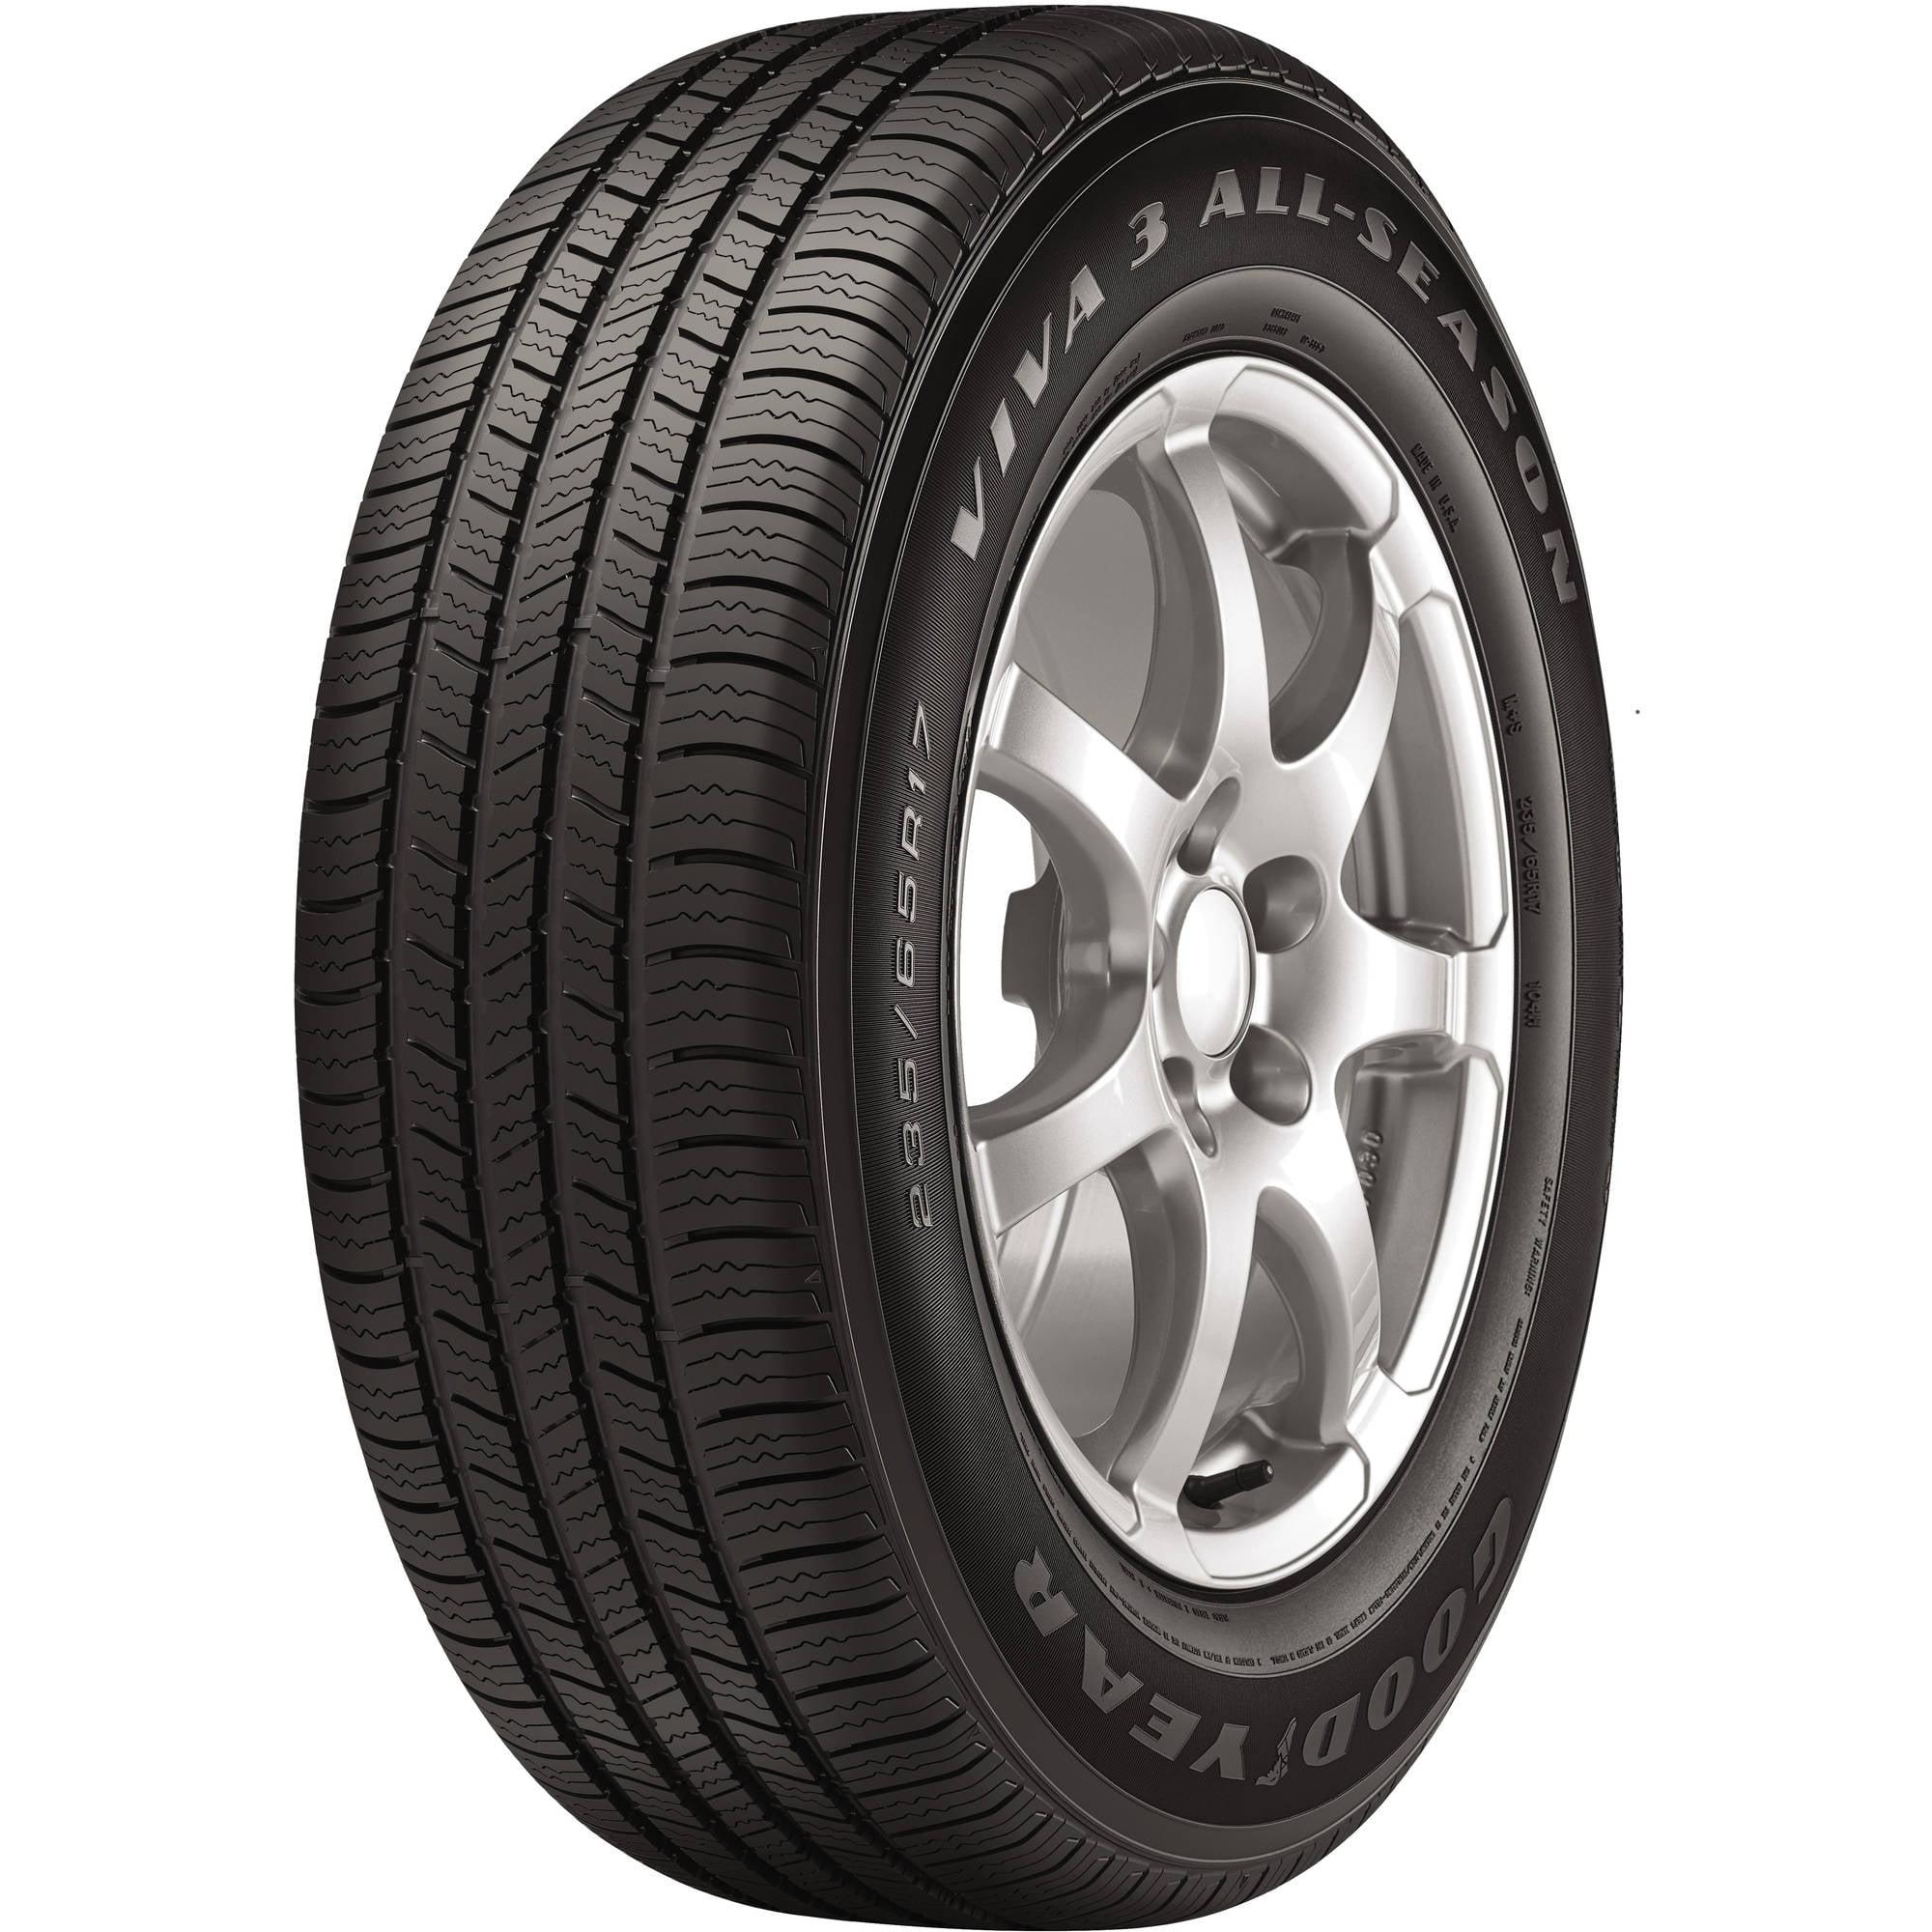 goodyear viva 3 all-season tire 215/60r17 96t - walmart